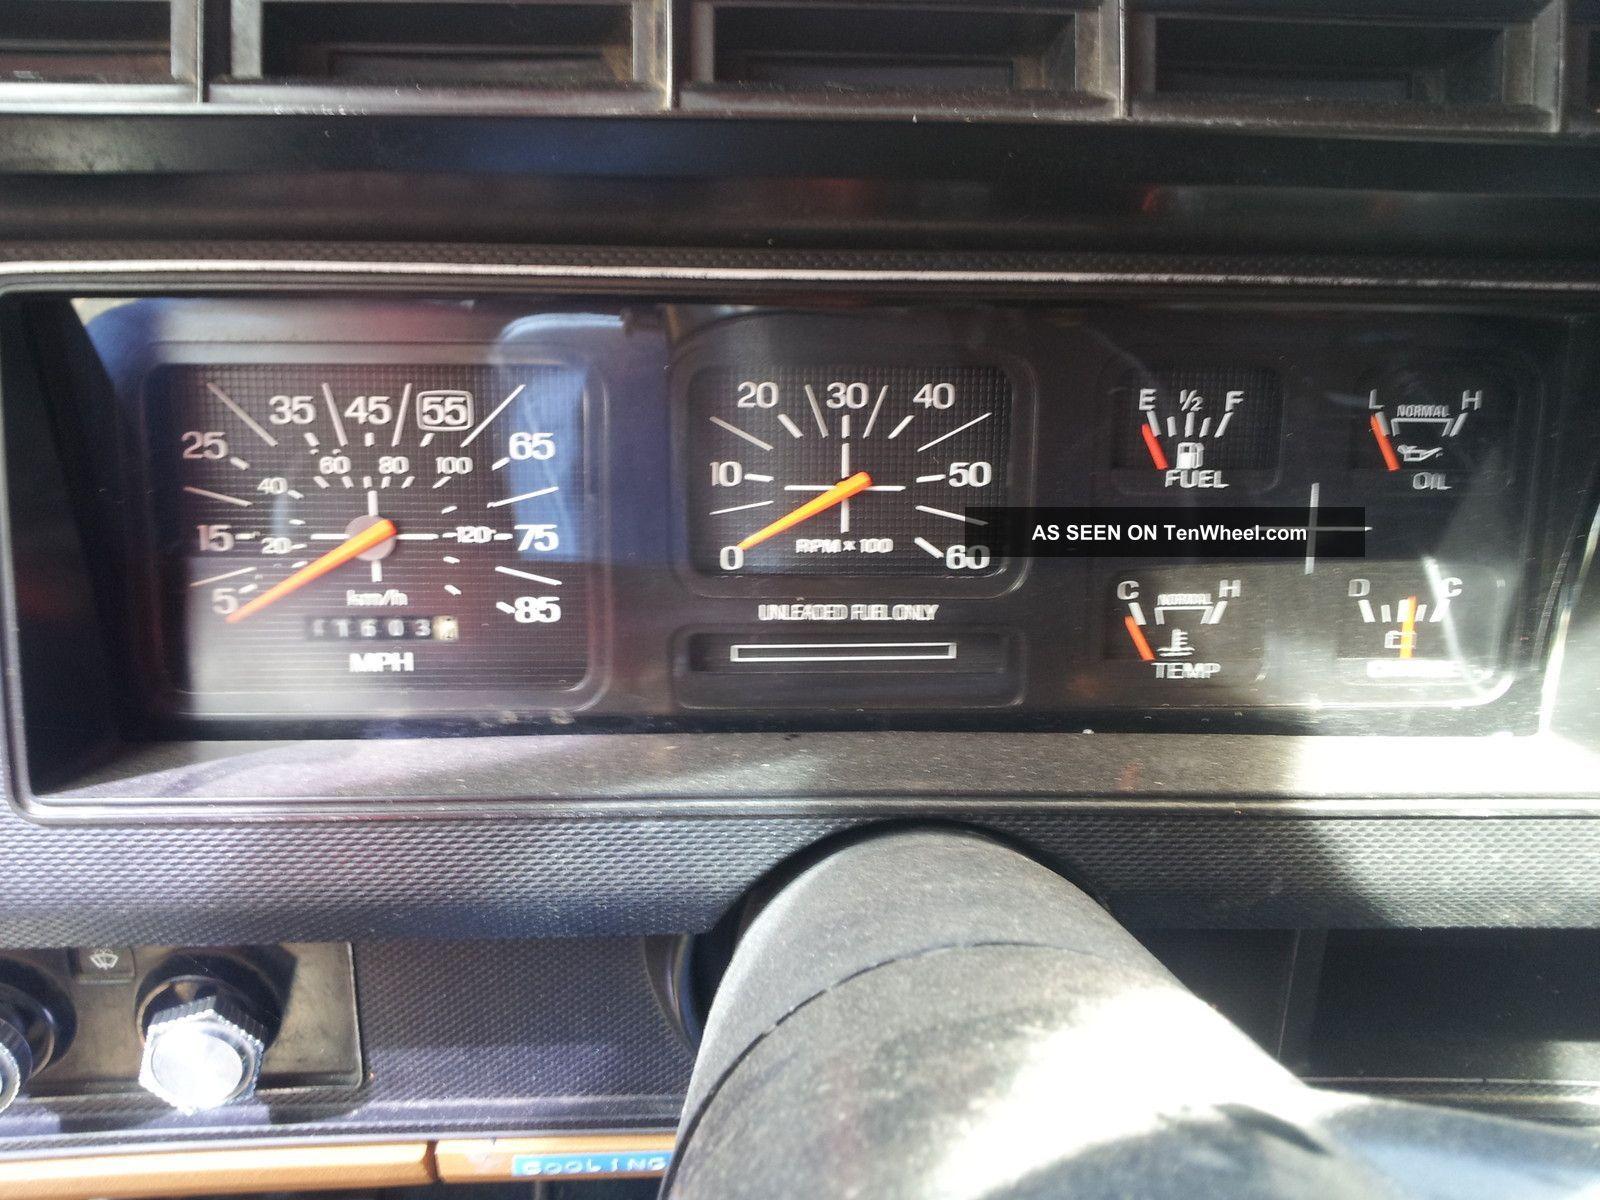 1980 ford bronco interior 1980 Ford Bronco. 390 Big